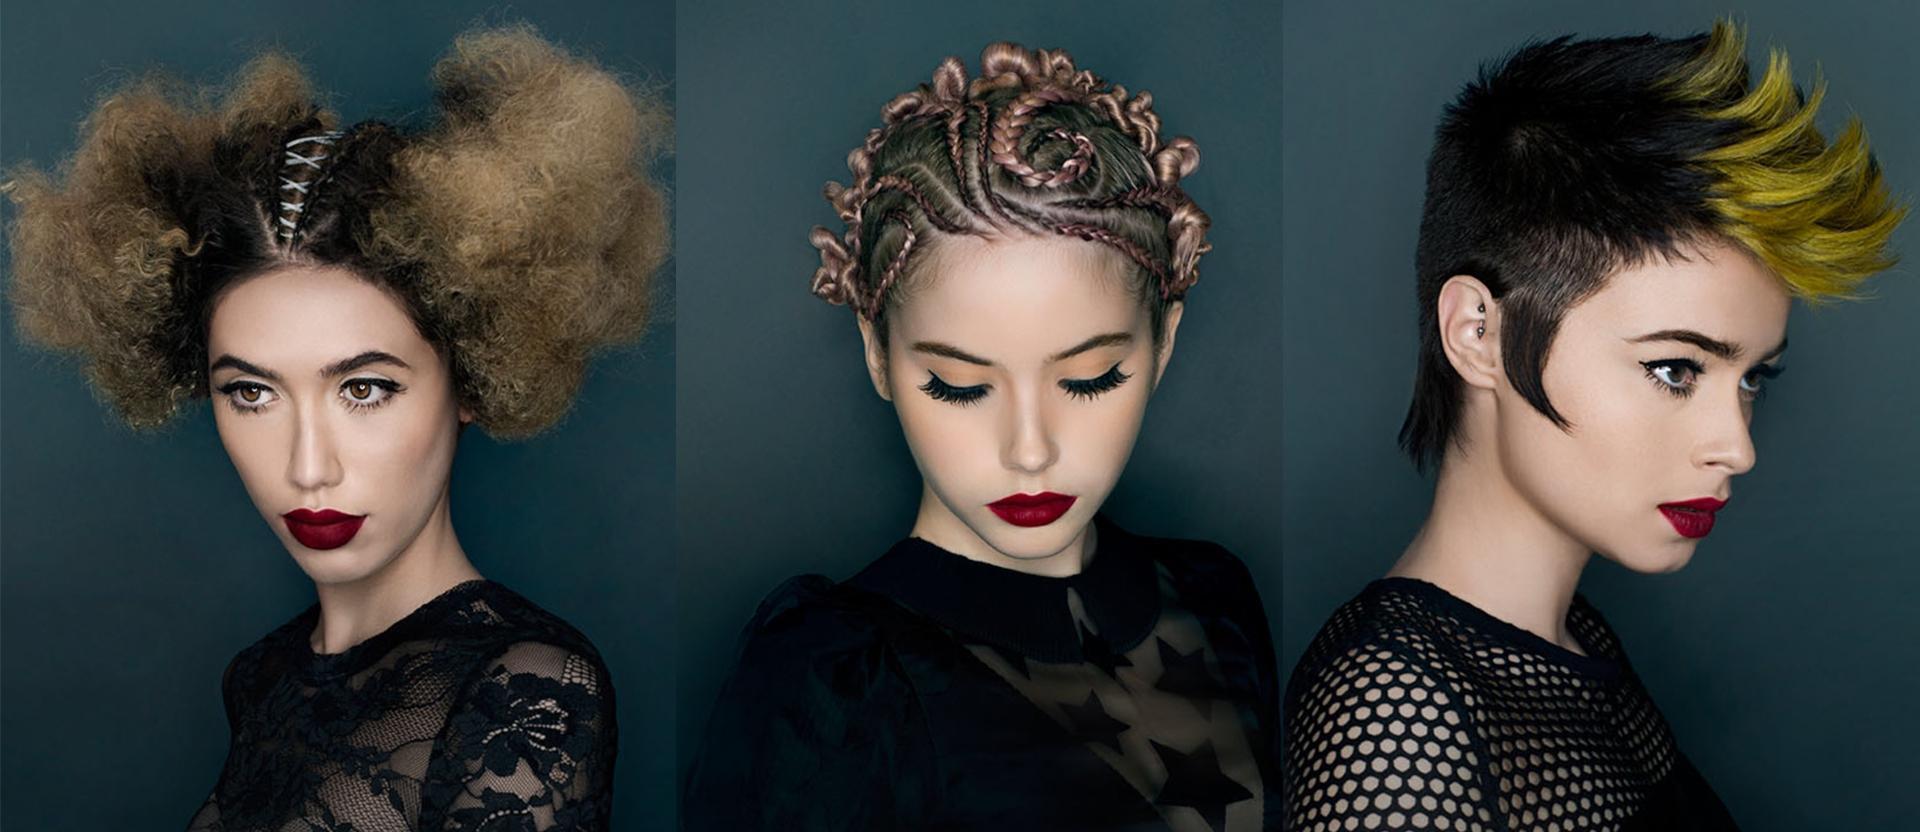 hair salon etobicoke contessa award winner 2018 salon collage